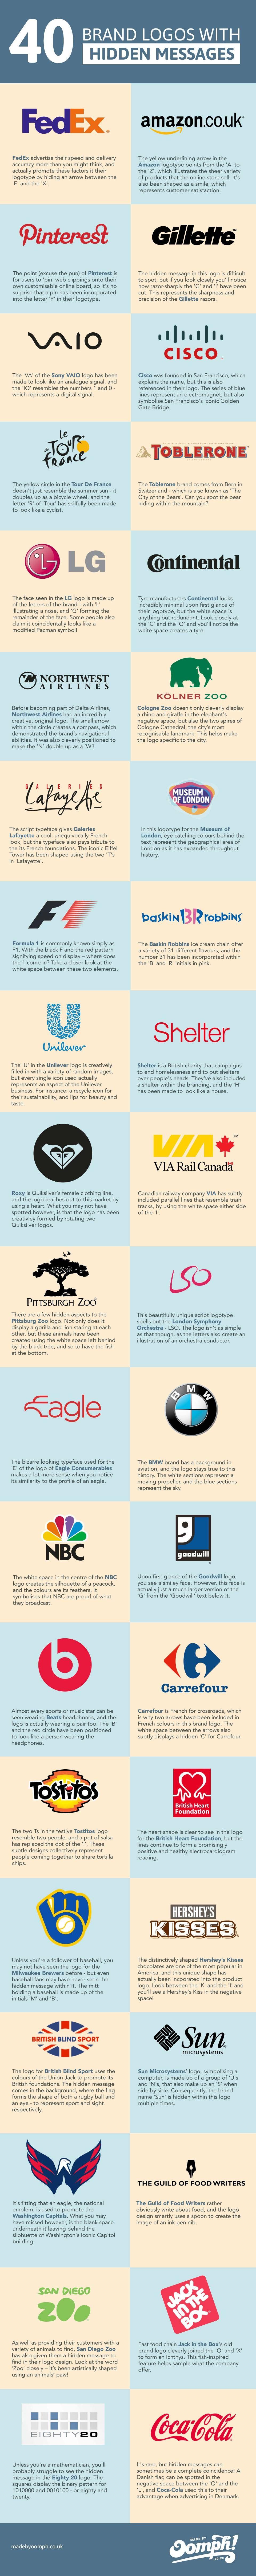 1000 images about branding on pinterest business innovation marketing and social media brand innovative hidden